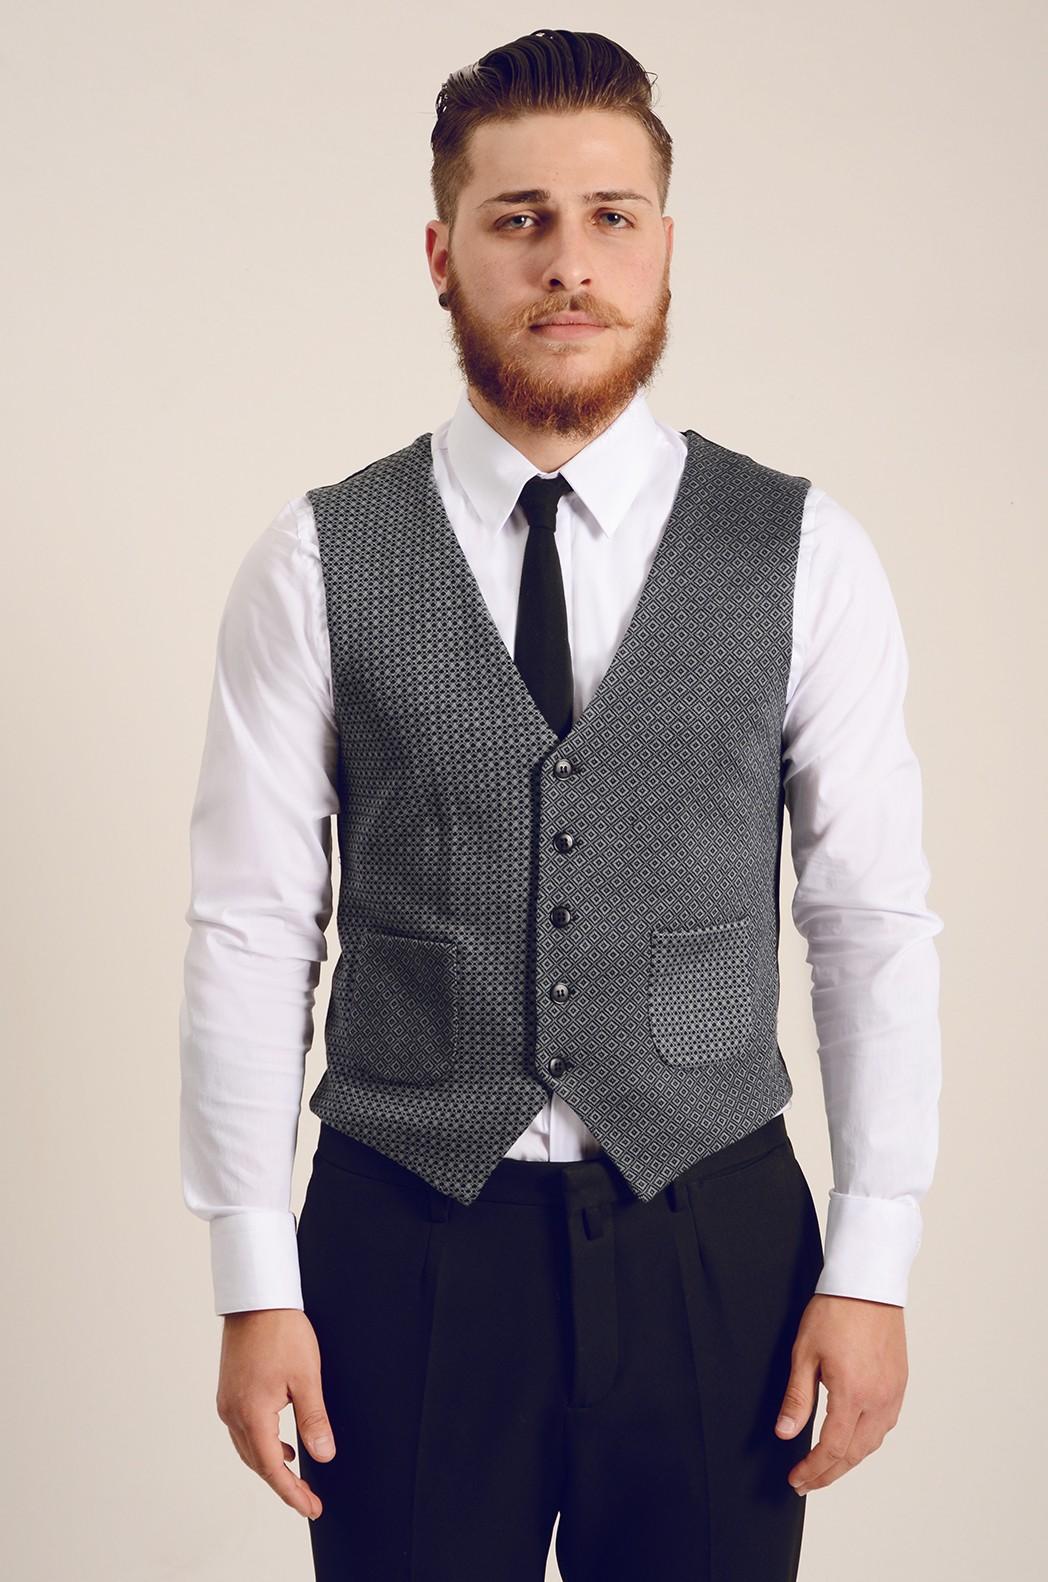 patch-pocket-vest-coat-mens-christmas-dress-up-fashion-3